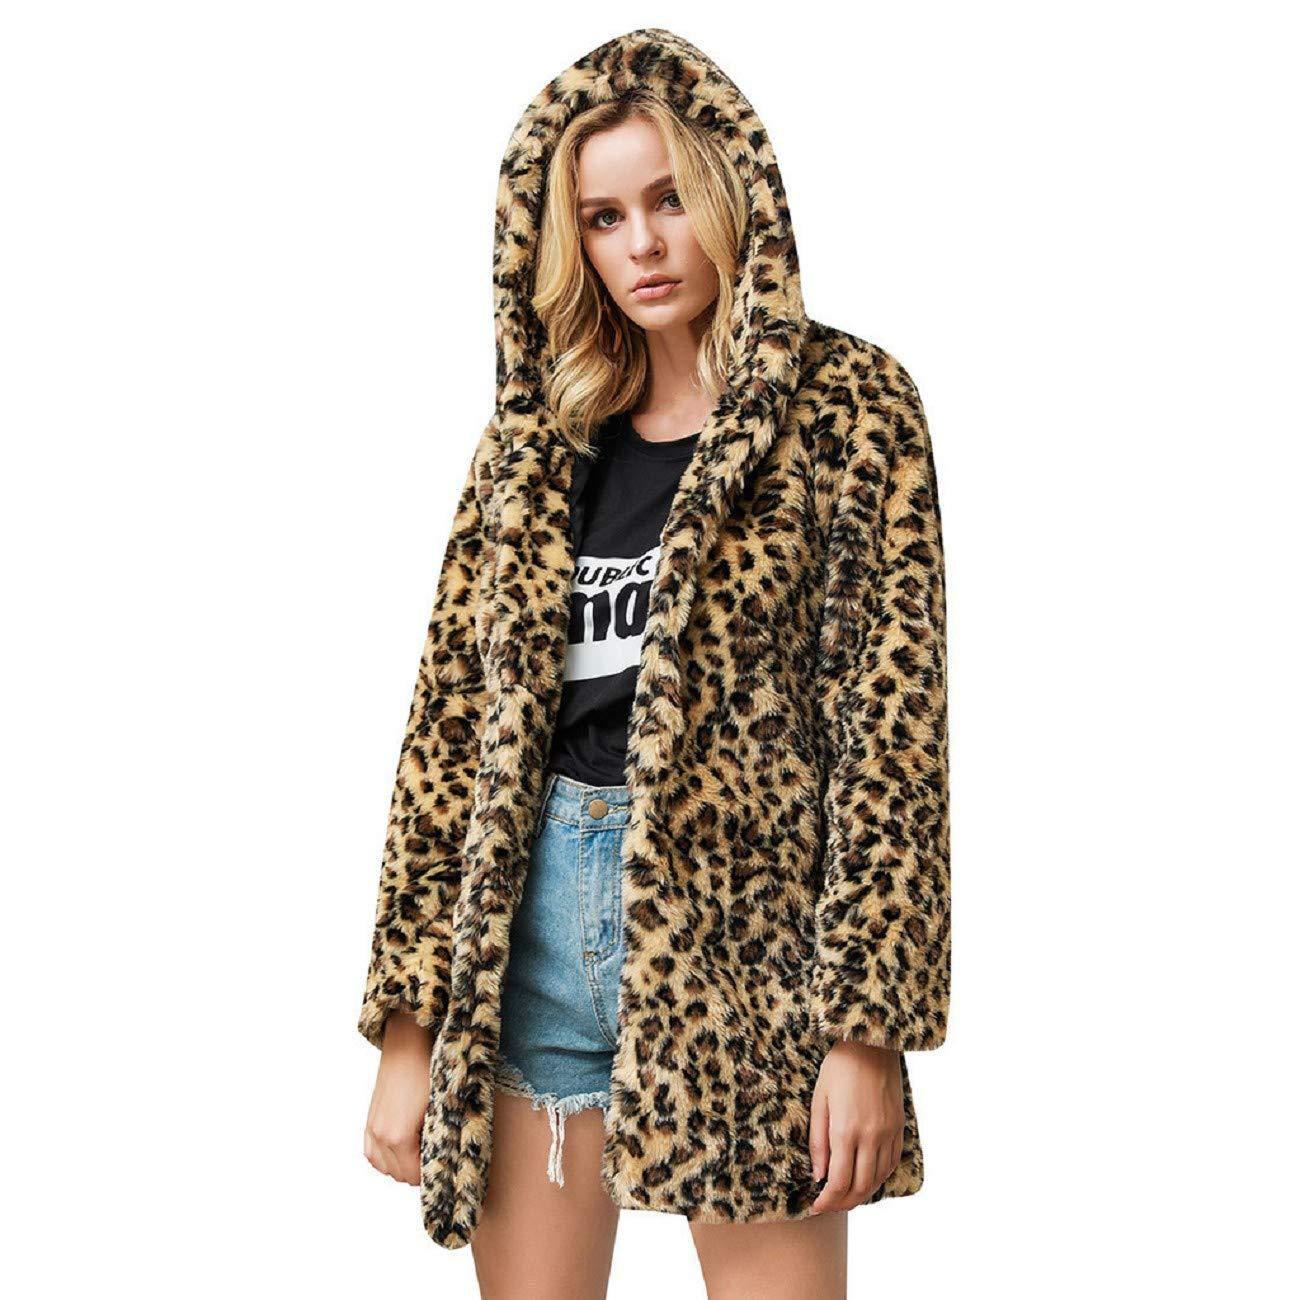 Reokoou Leopard Faux Fur Stylish Outwear Ladies Cardigan Loose Hoodie Plush Jacket Long Sleeve Pocket Cozy Fluffy Coat Khaki by Reokoou